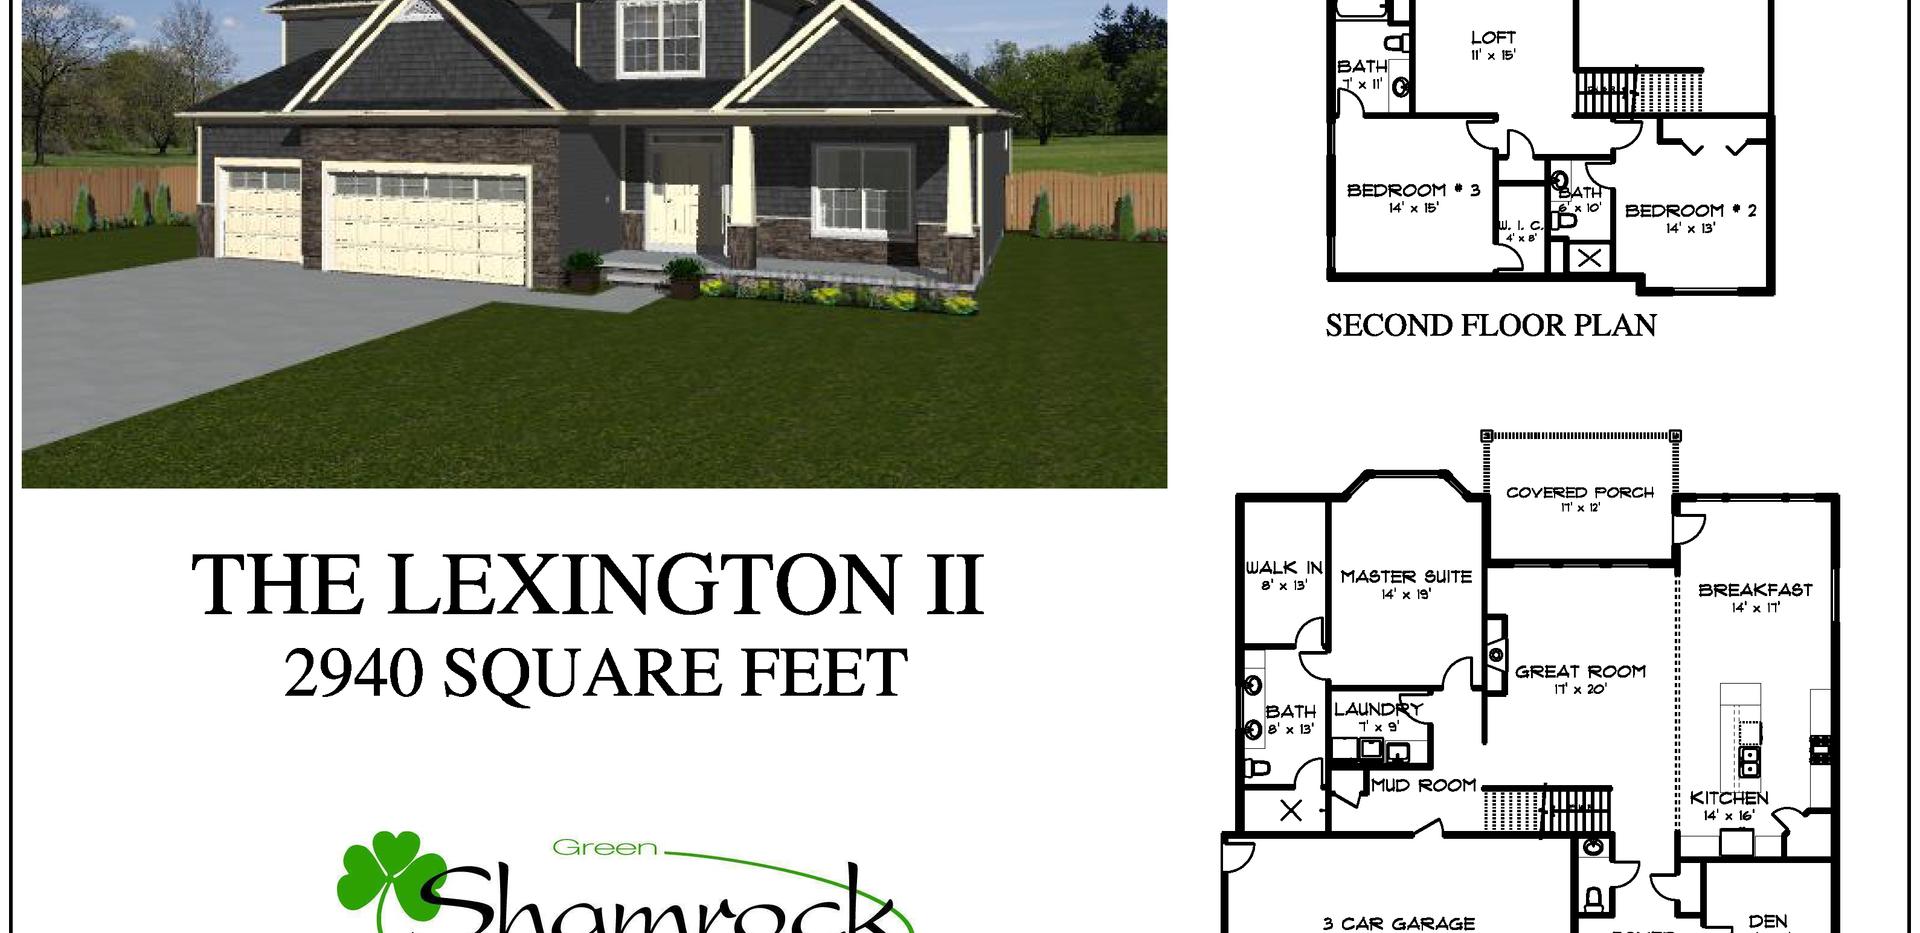 The Lexington II